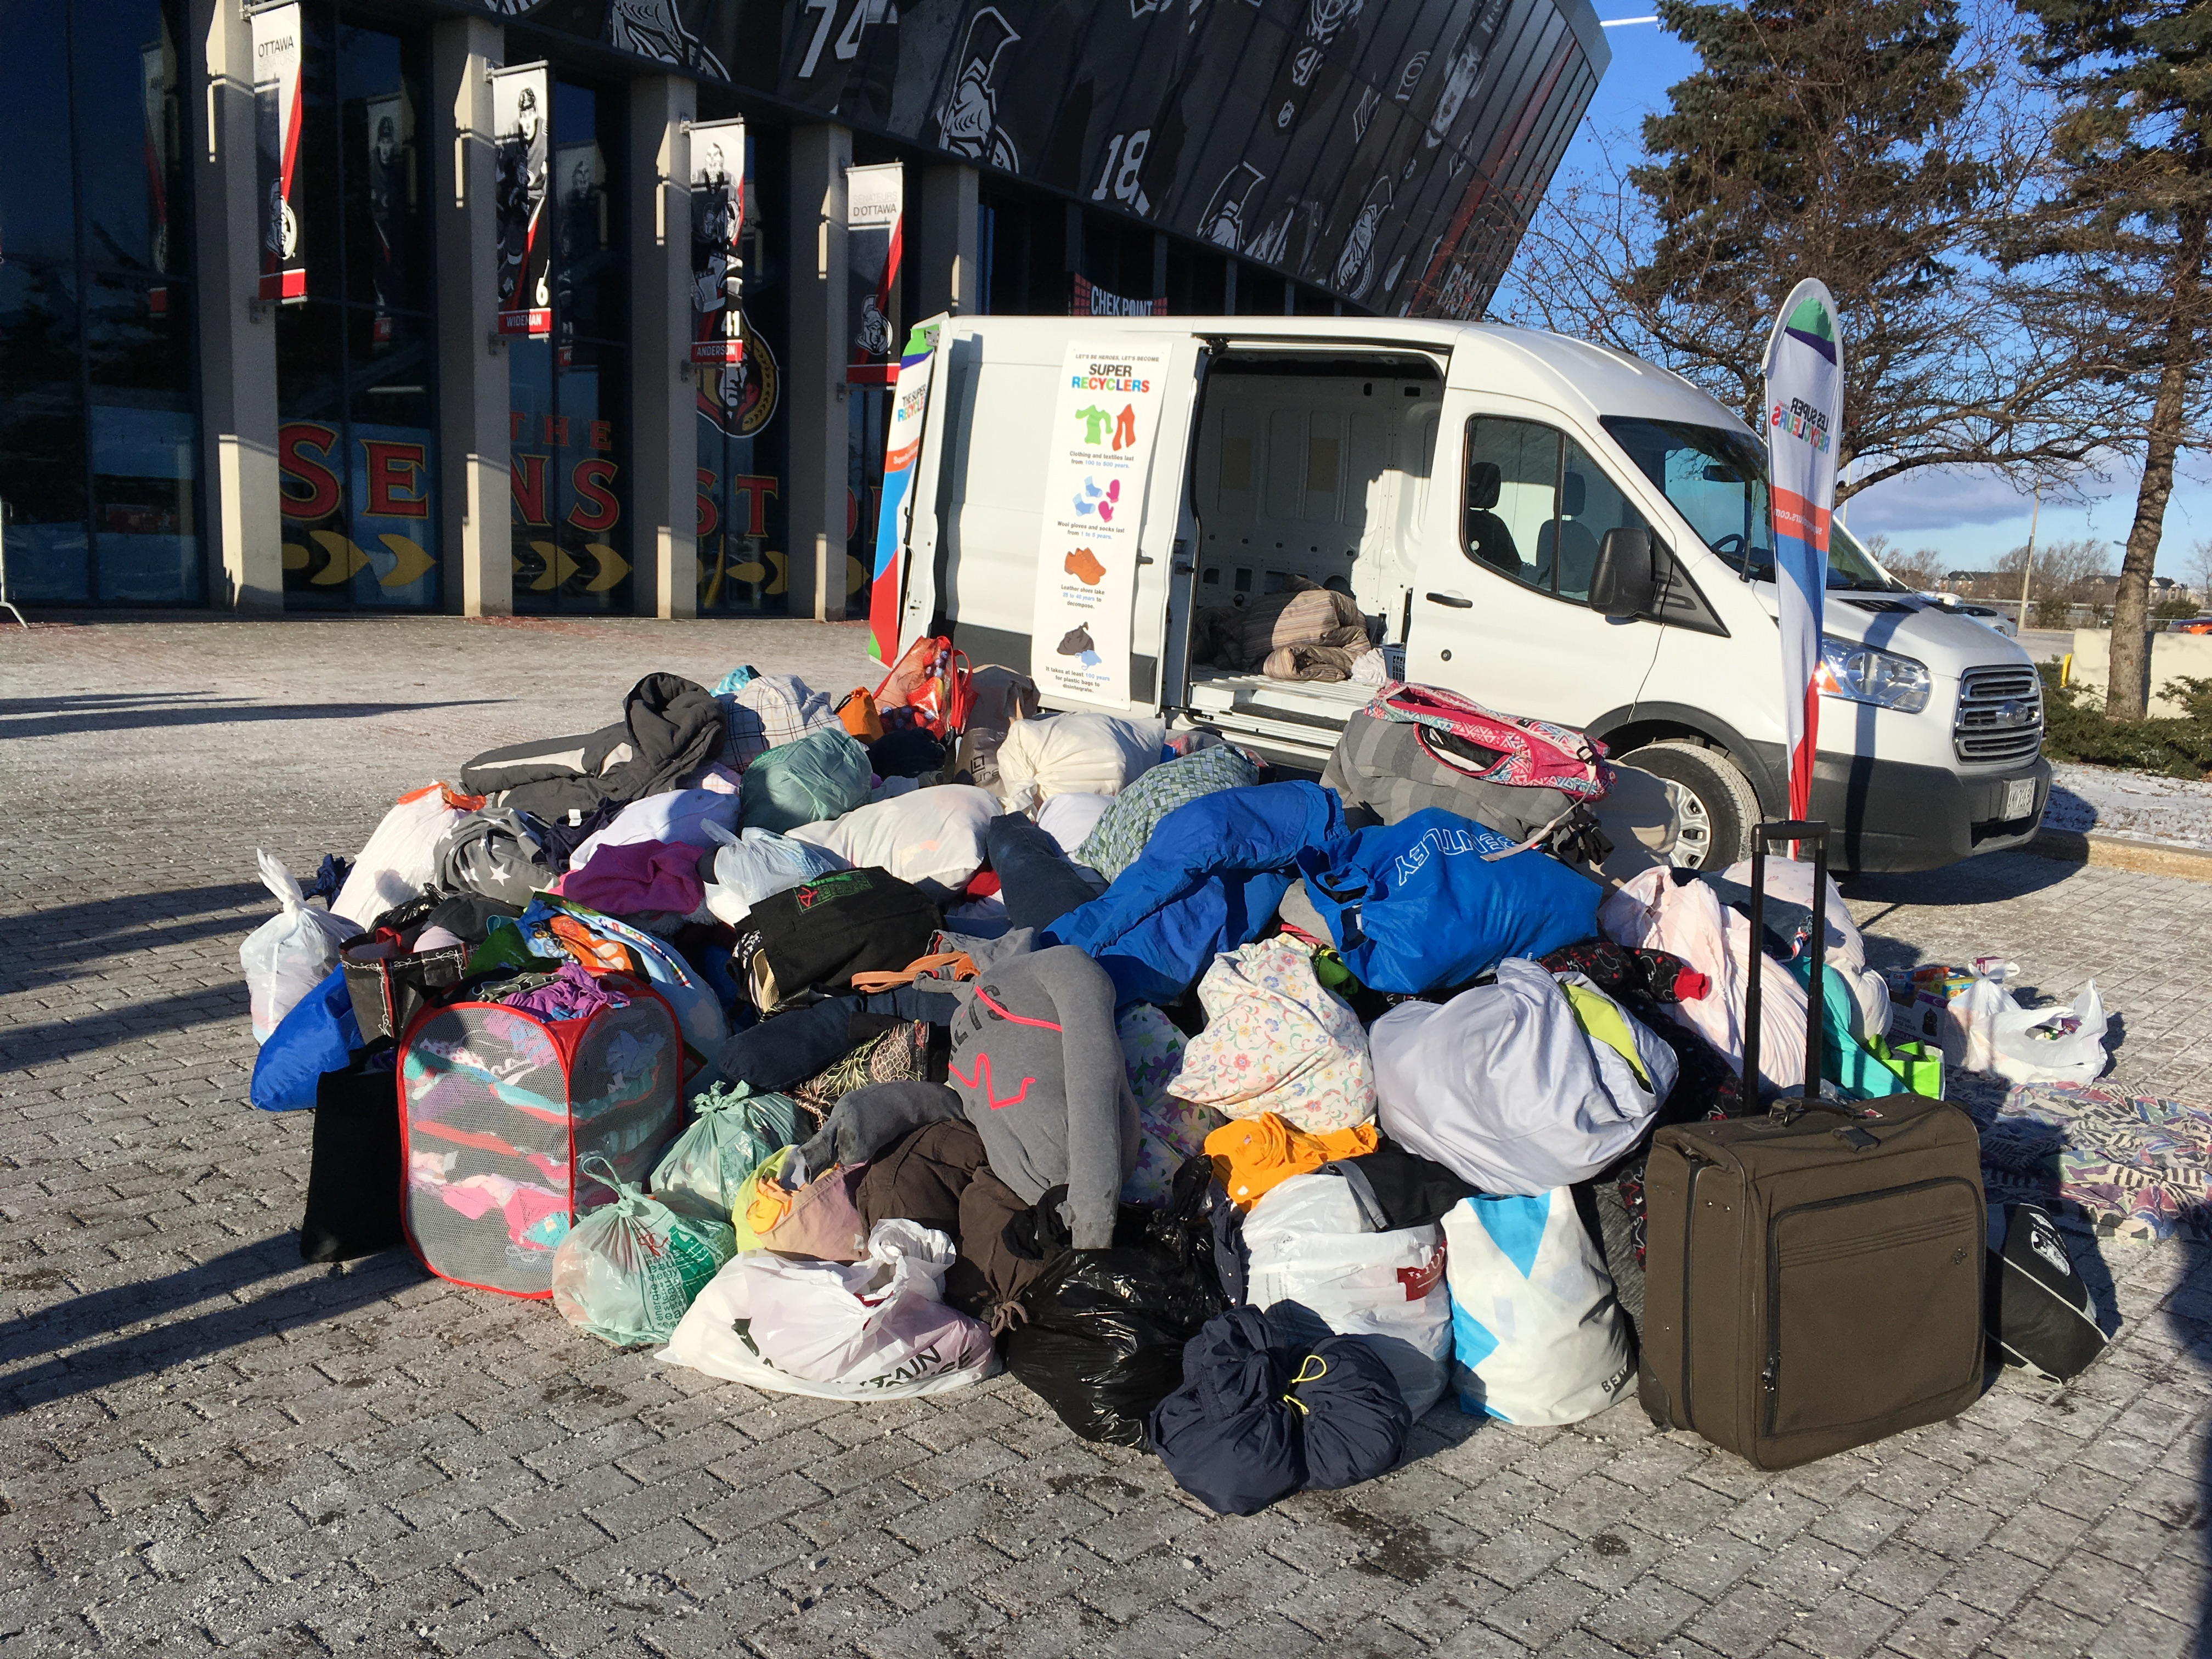 Collecte pour WE Day - Ottawa